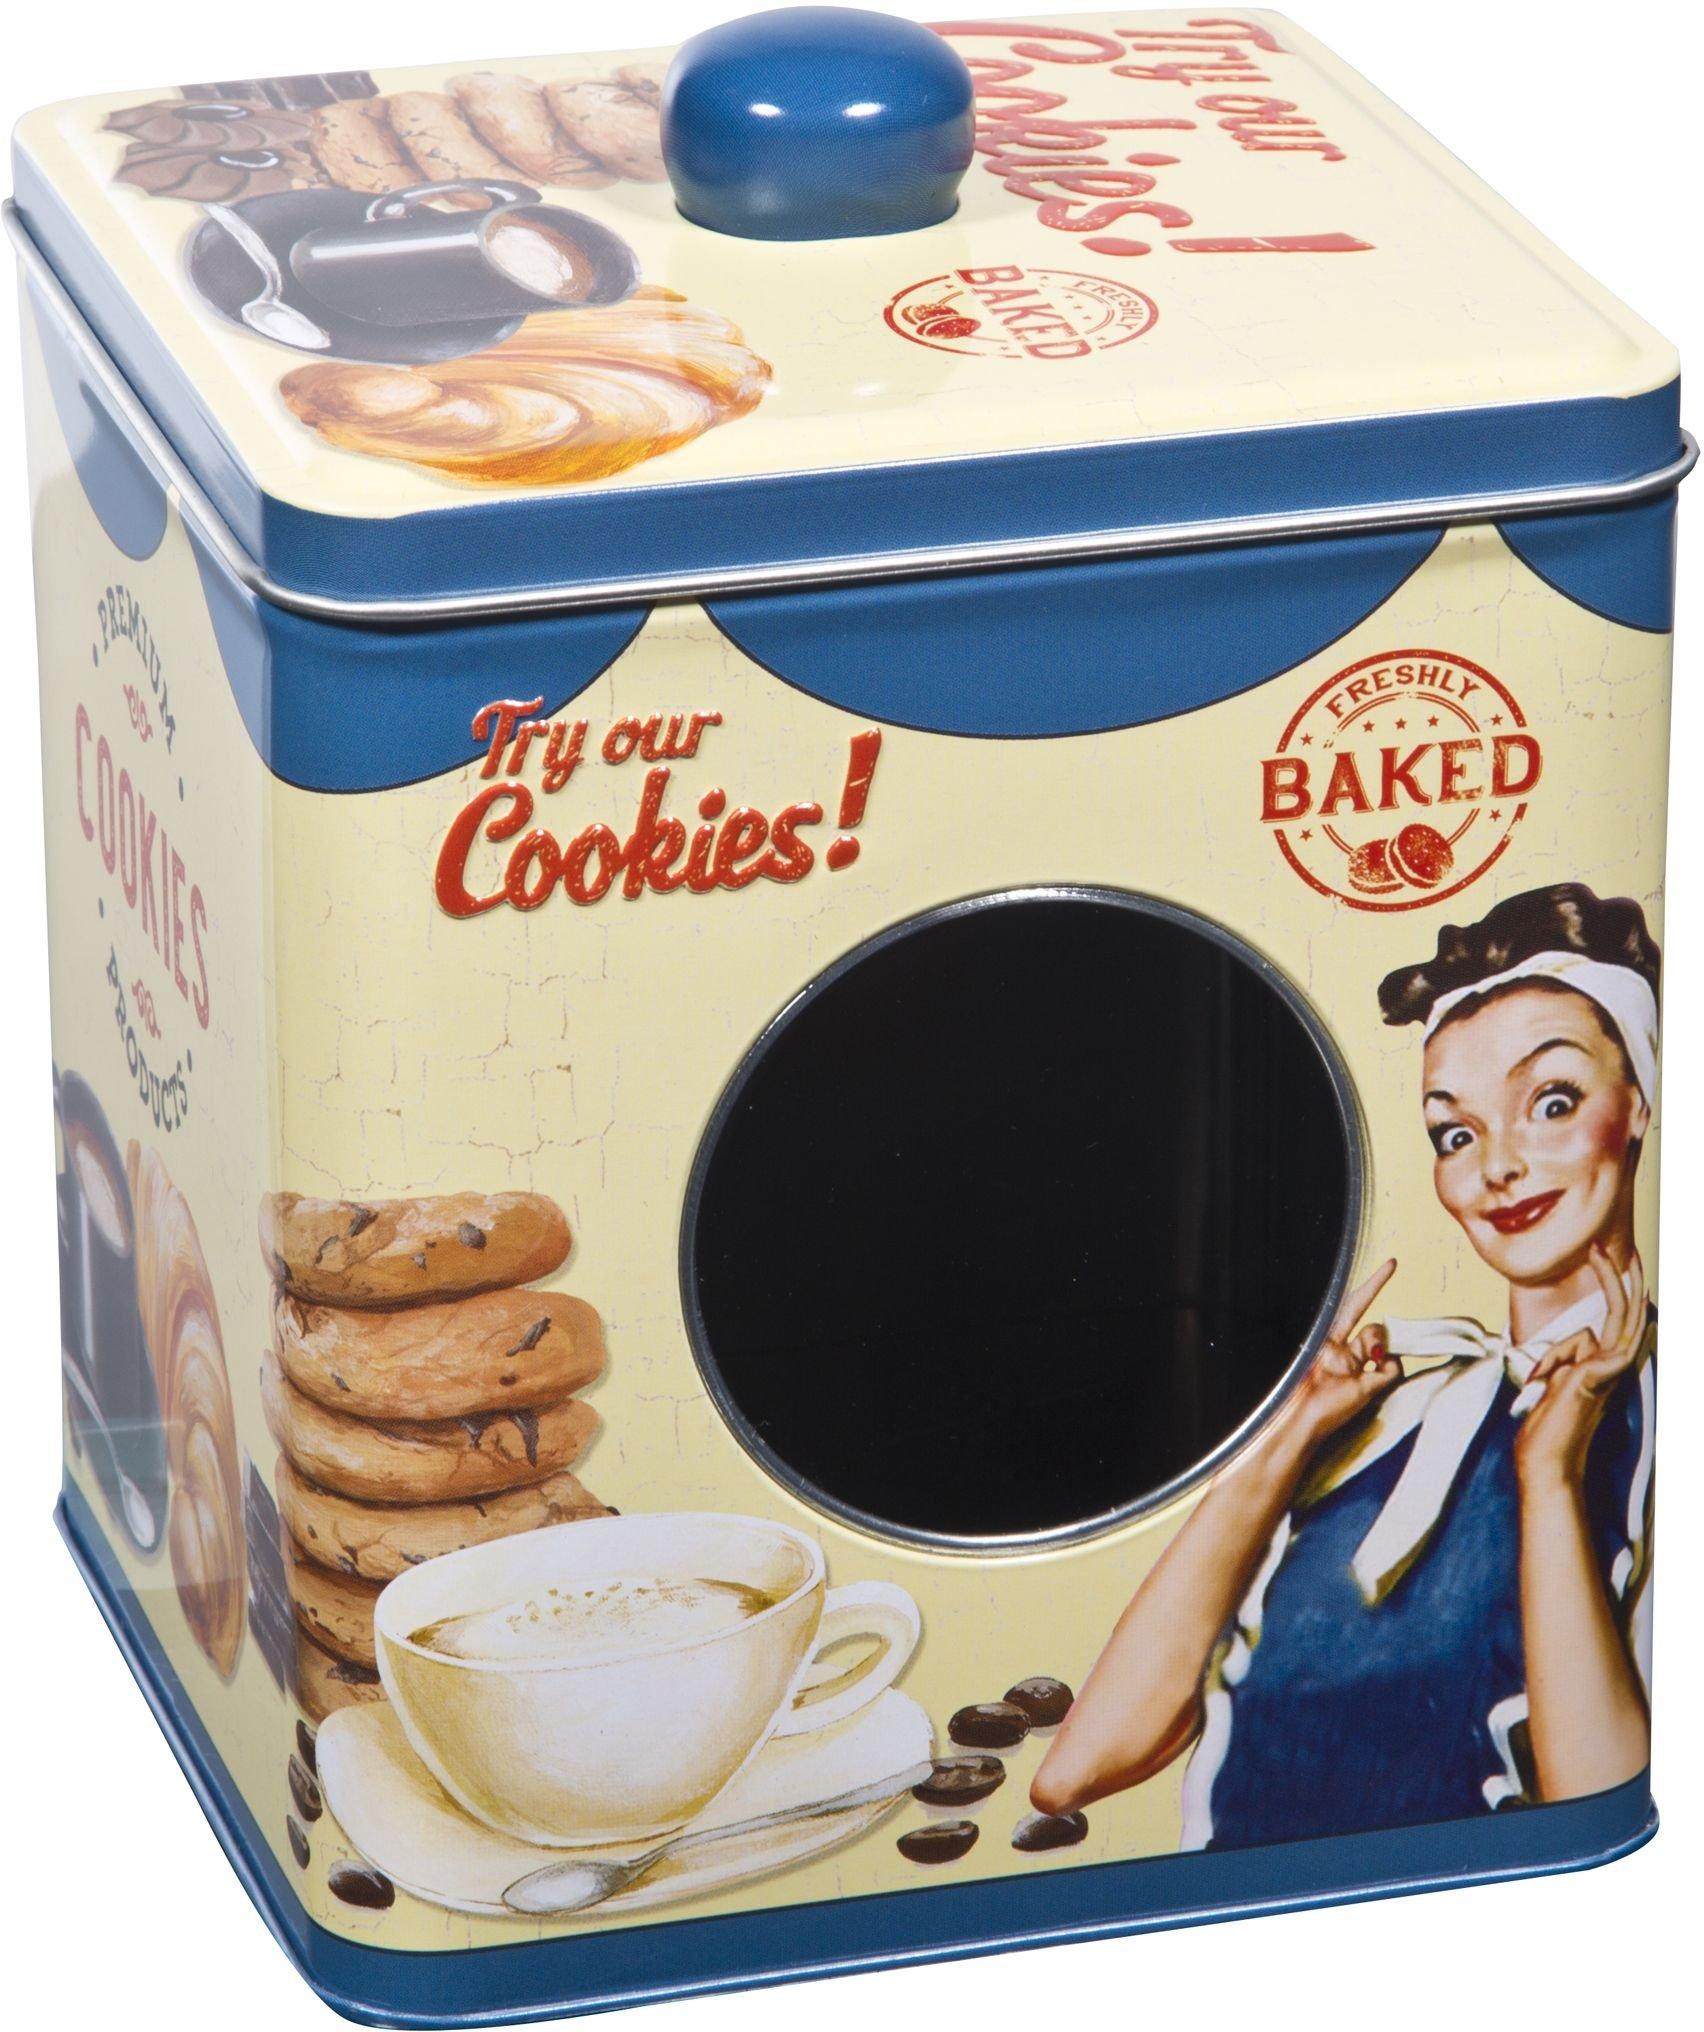 Kitchen Food Storage Tin Cookie, Tea, Sugar, Cupcakes Box With Window 5.75''H